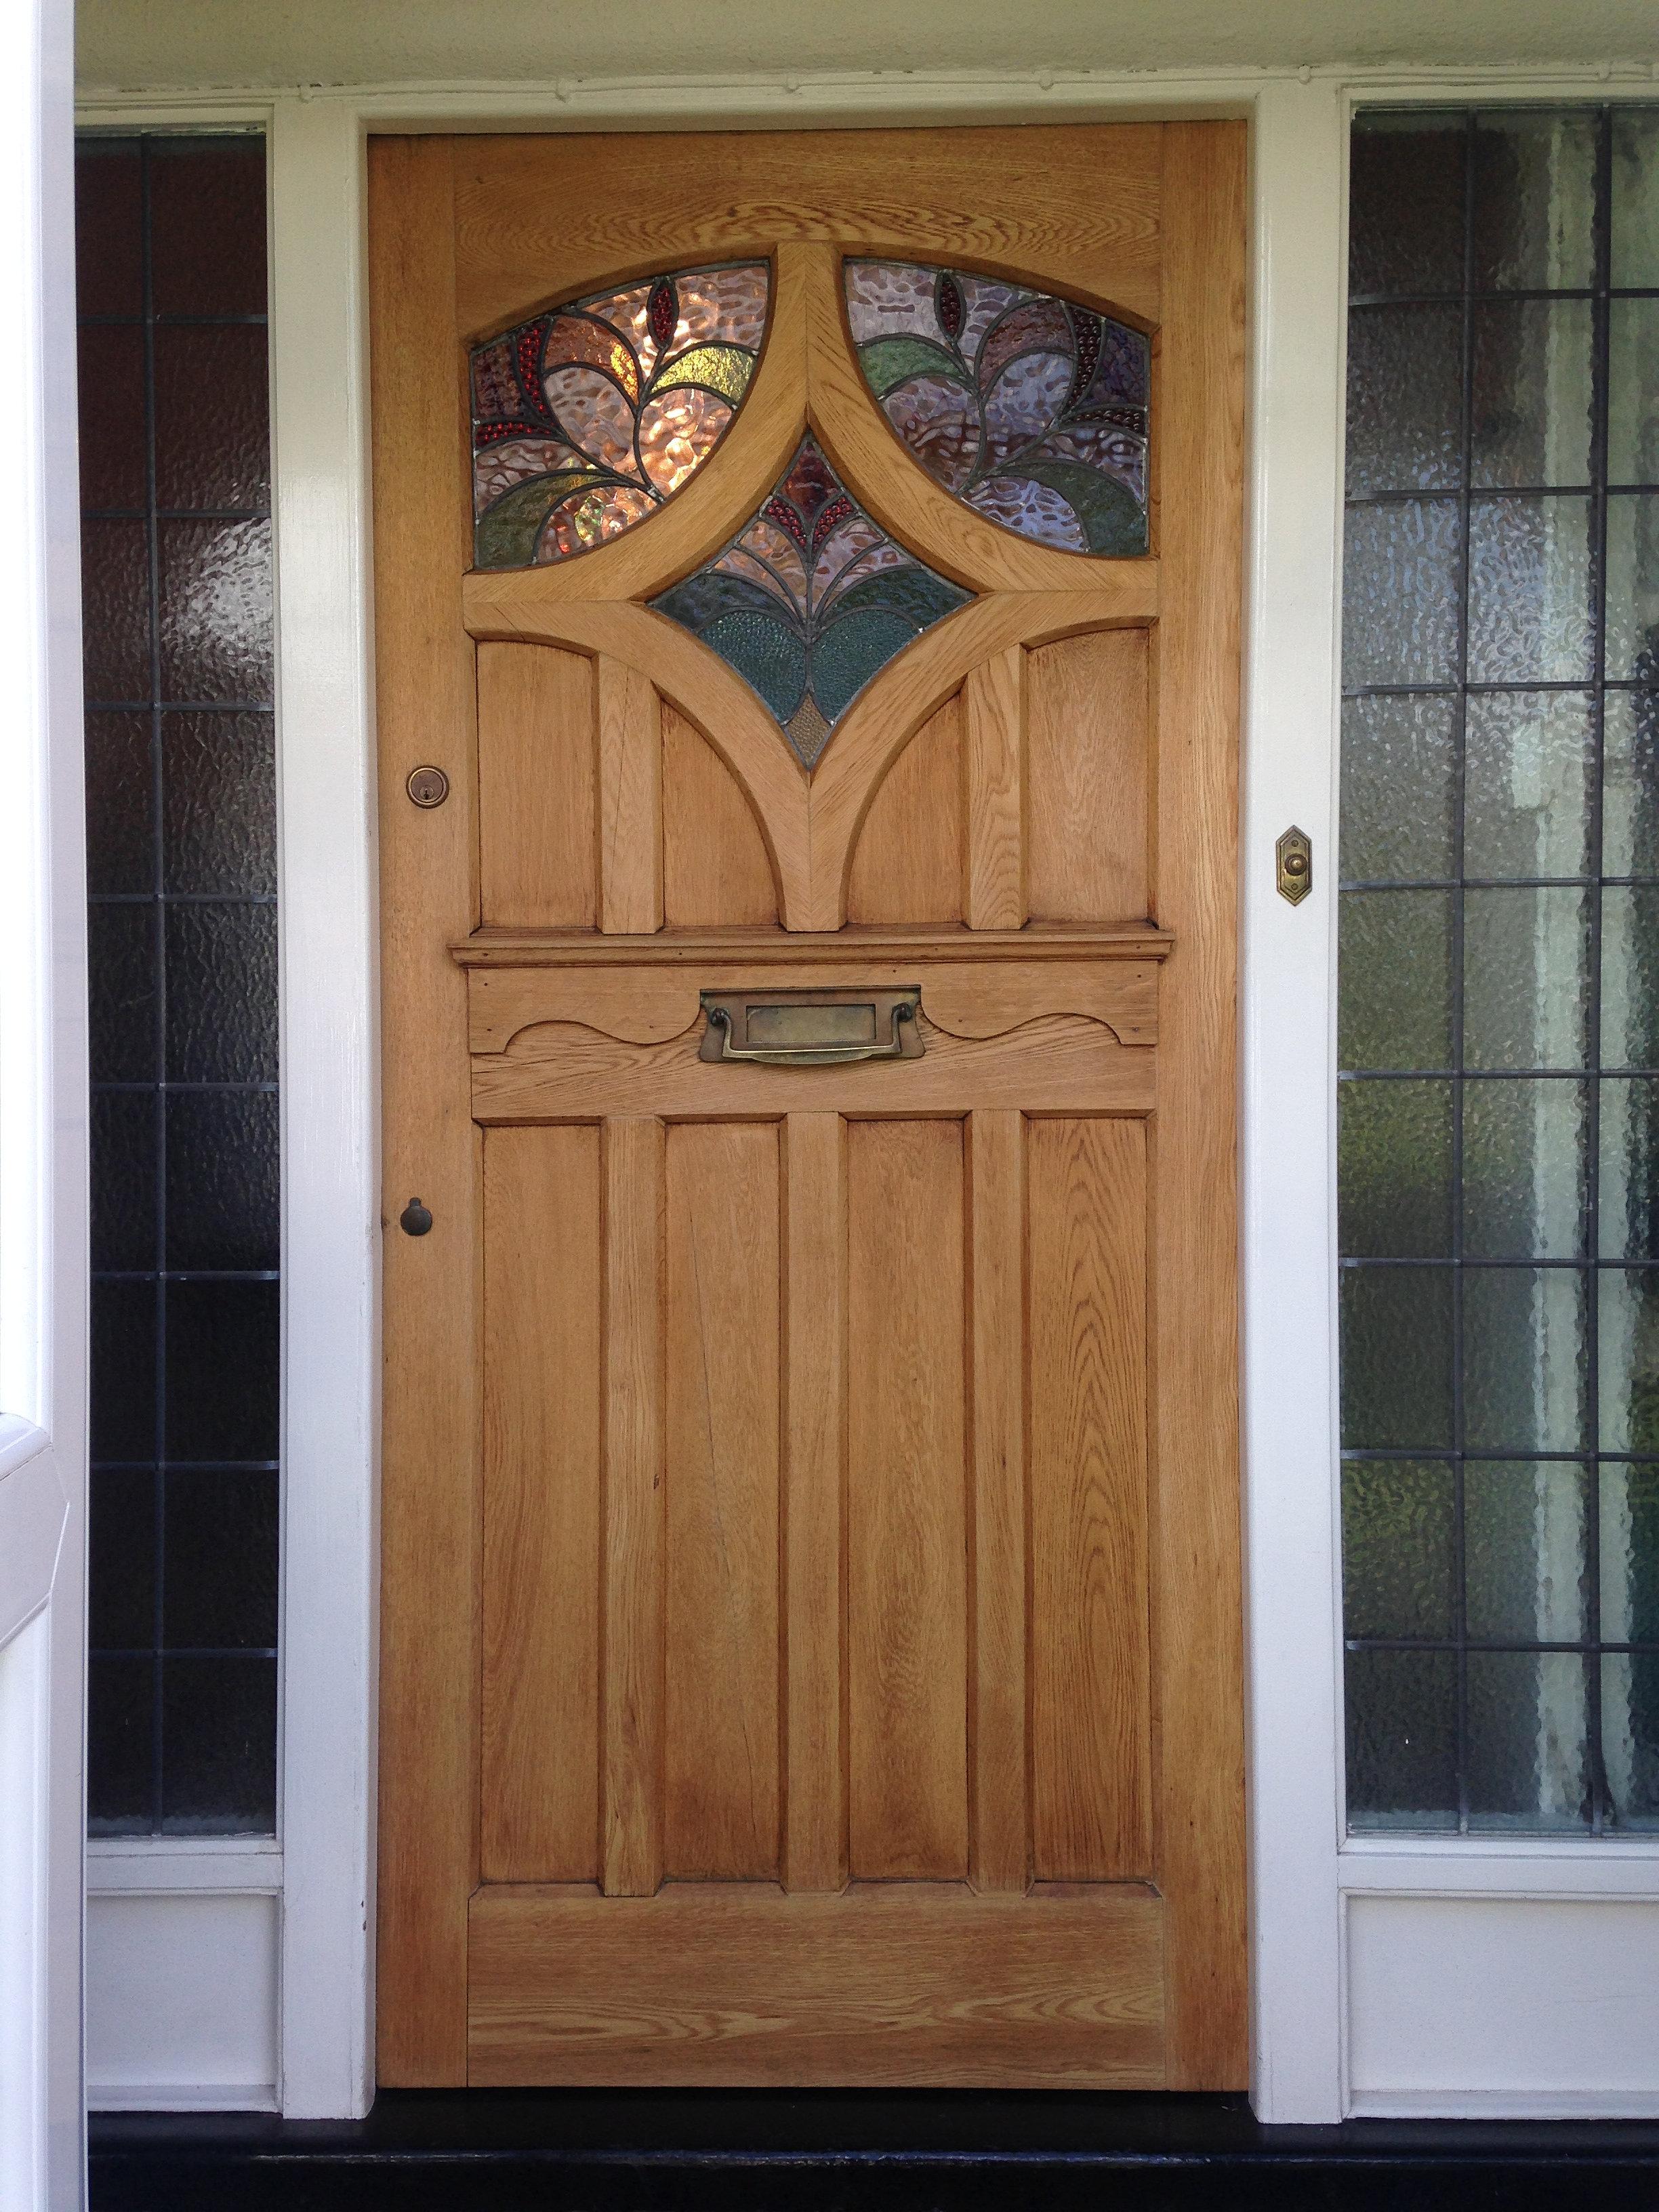 3264 #72482A Victorian Door Company Bespoke Wooden Front Doors Oak Front Door  pic Wooden Front Doors With Side Panels 40612448